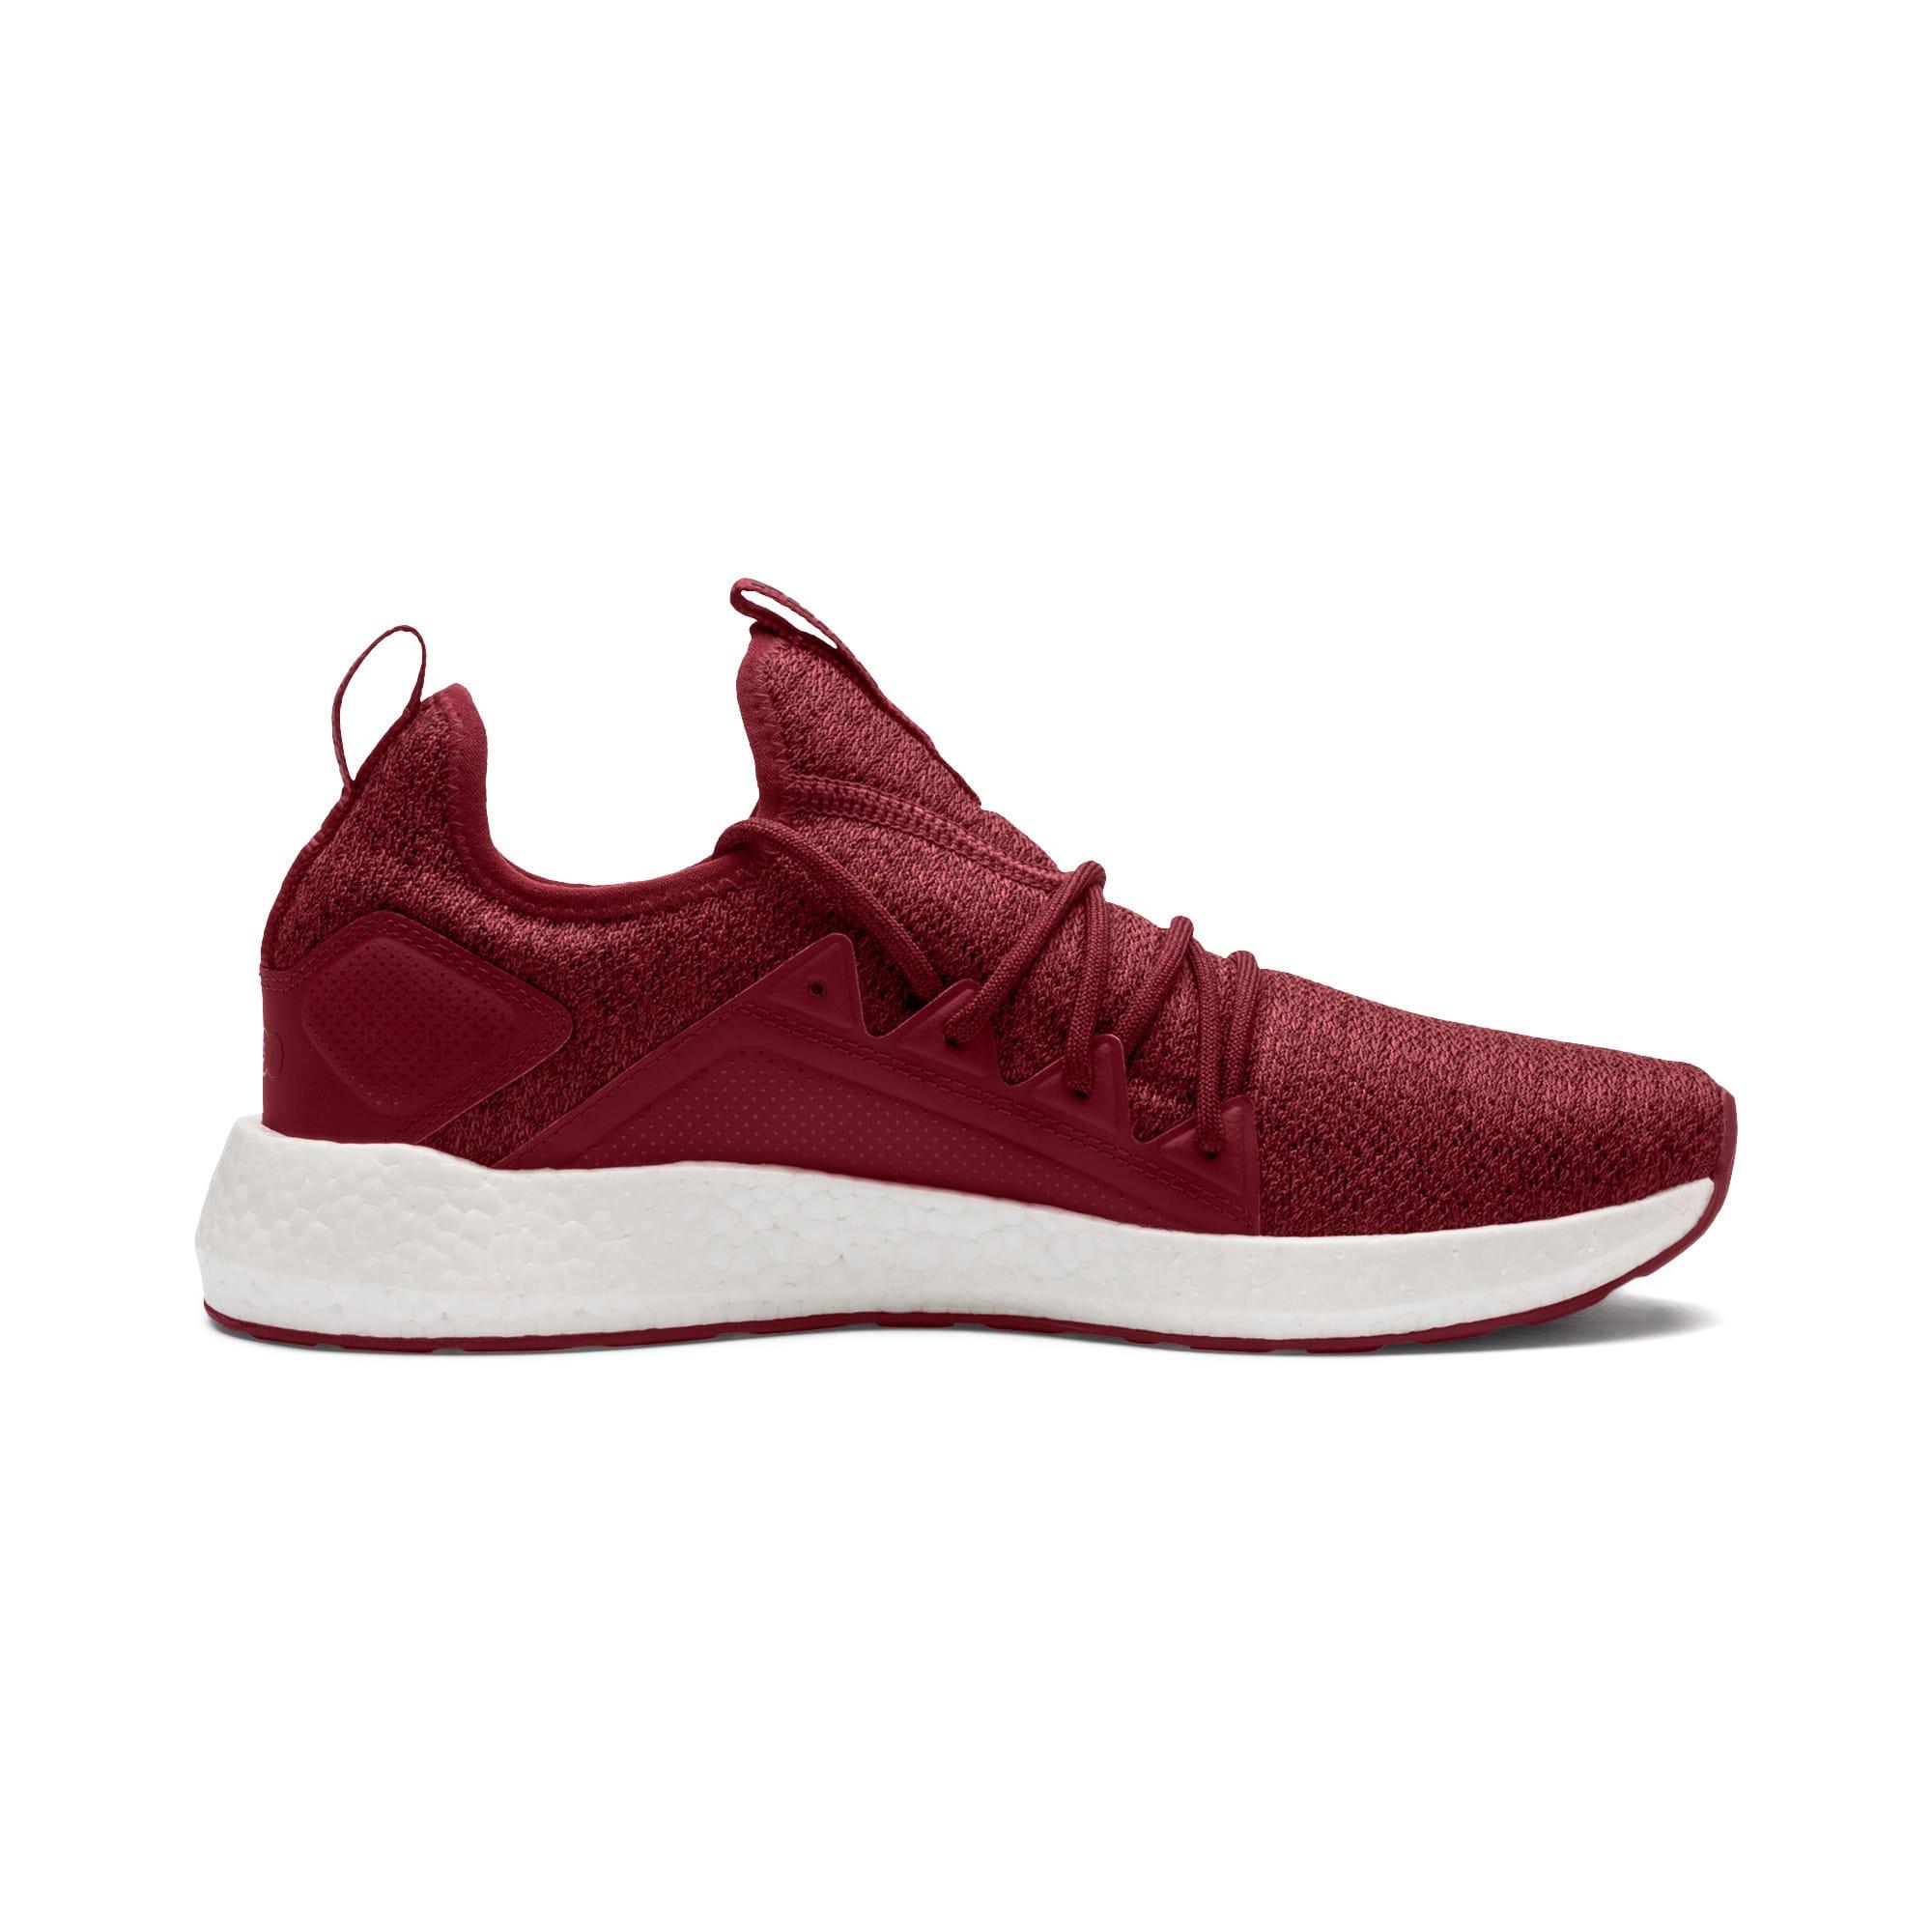 Thumbnail 5 of NRGY Neko Knit Men's Running Shoes, Pomegranate-Puma Black, medium